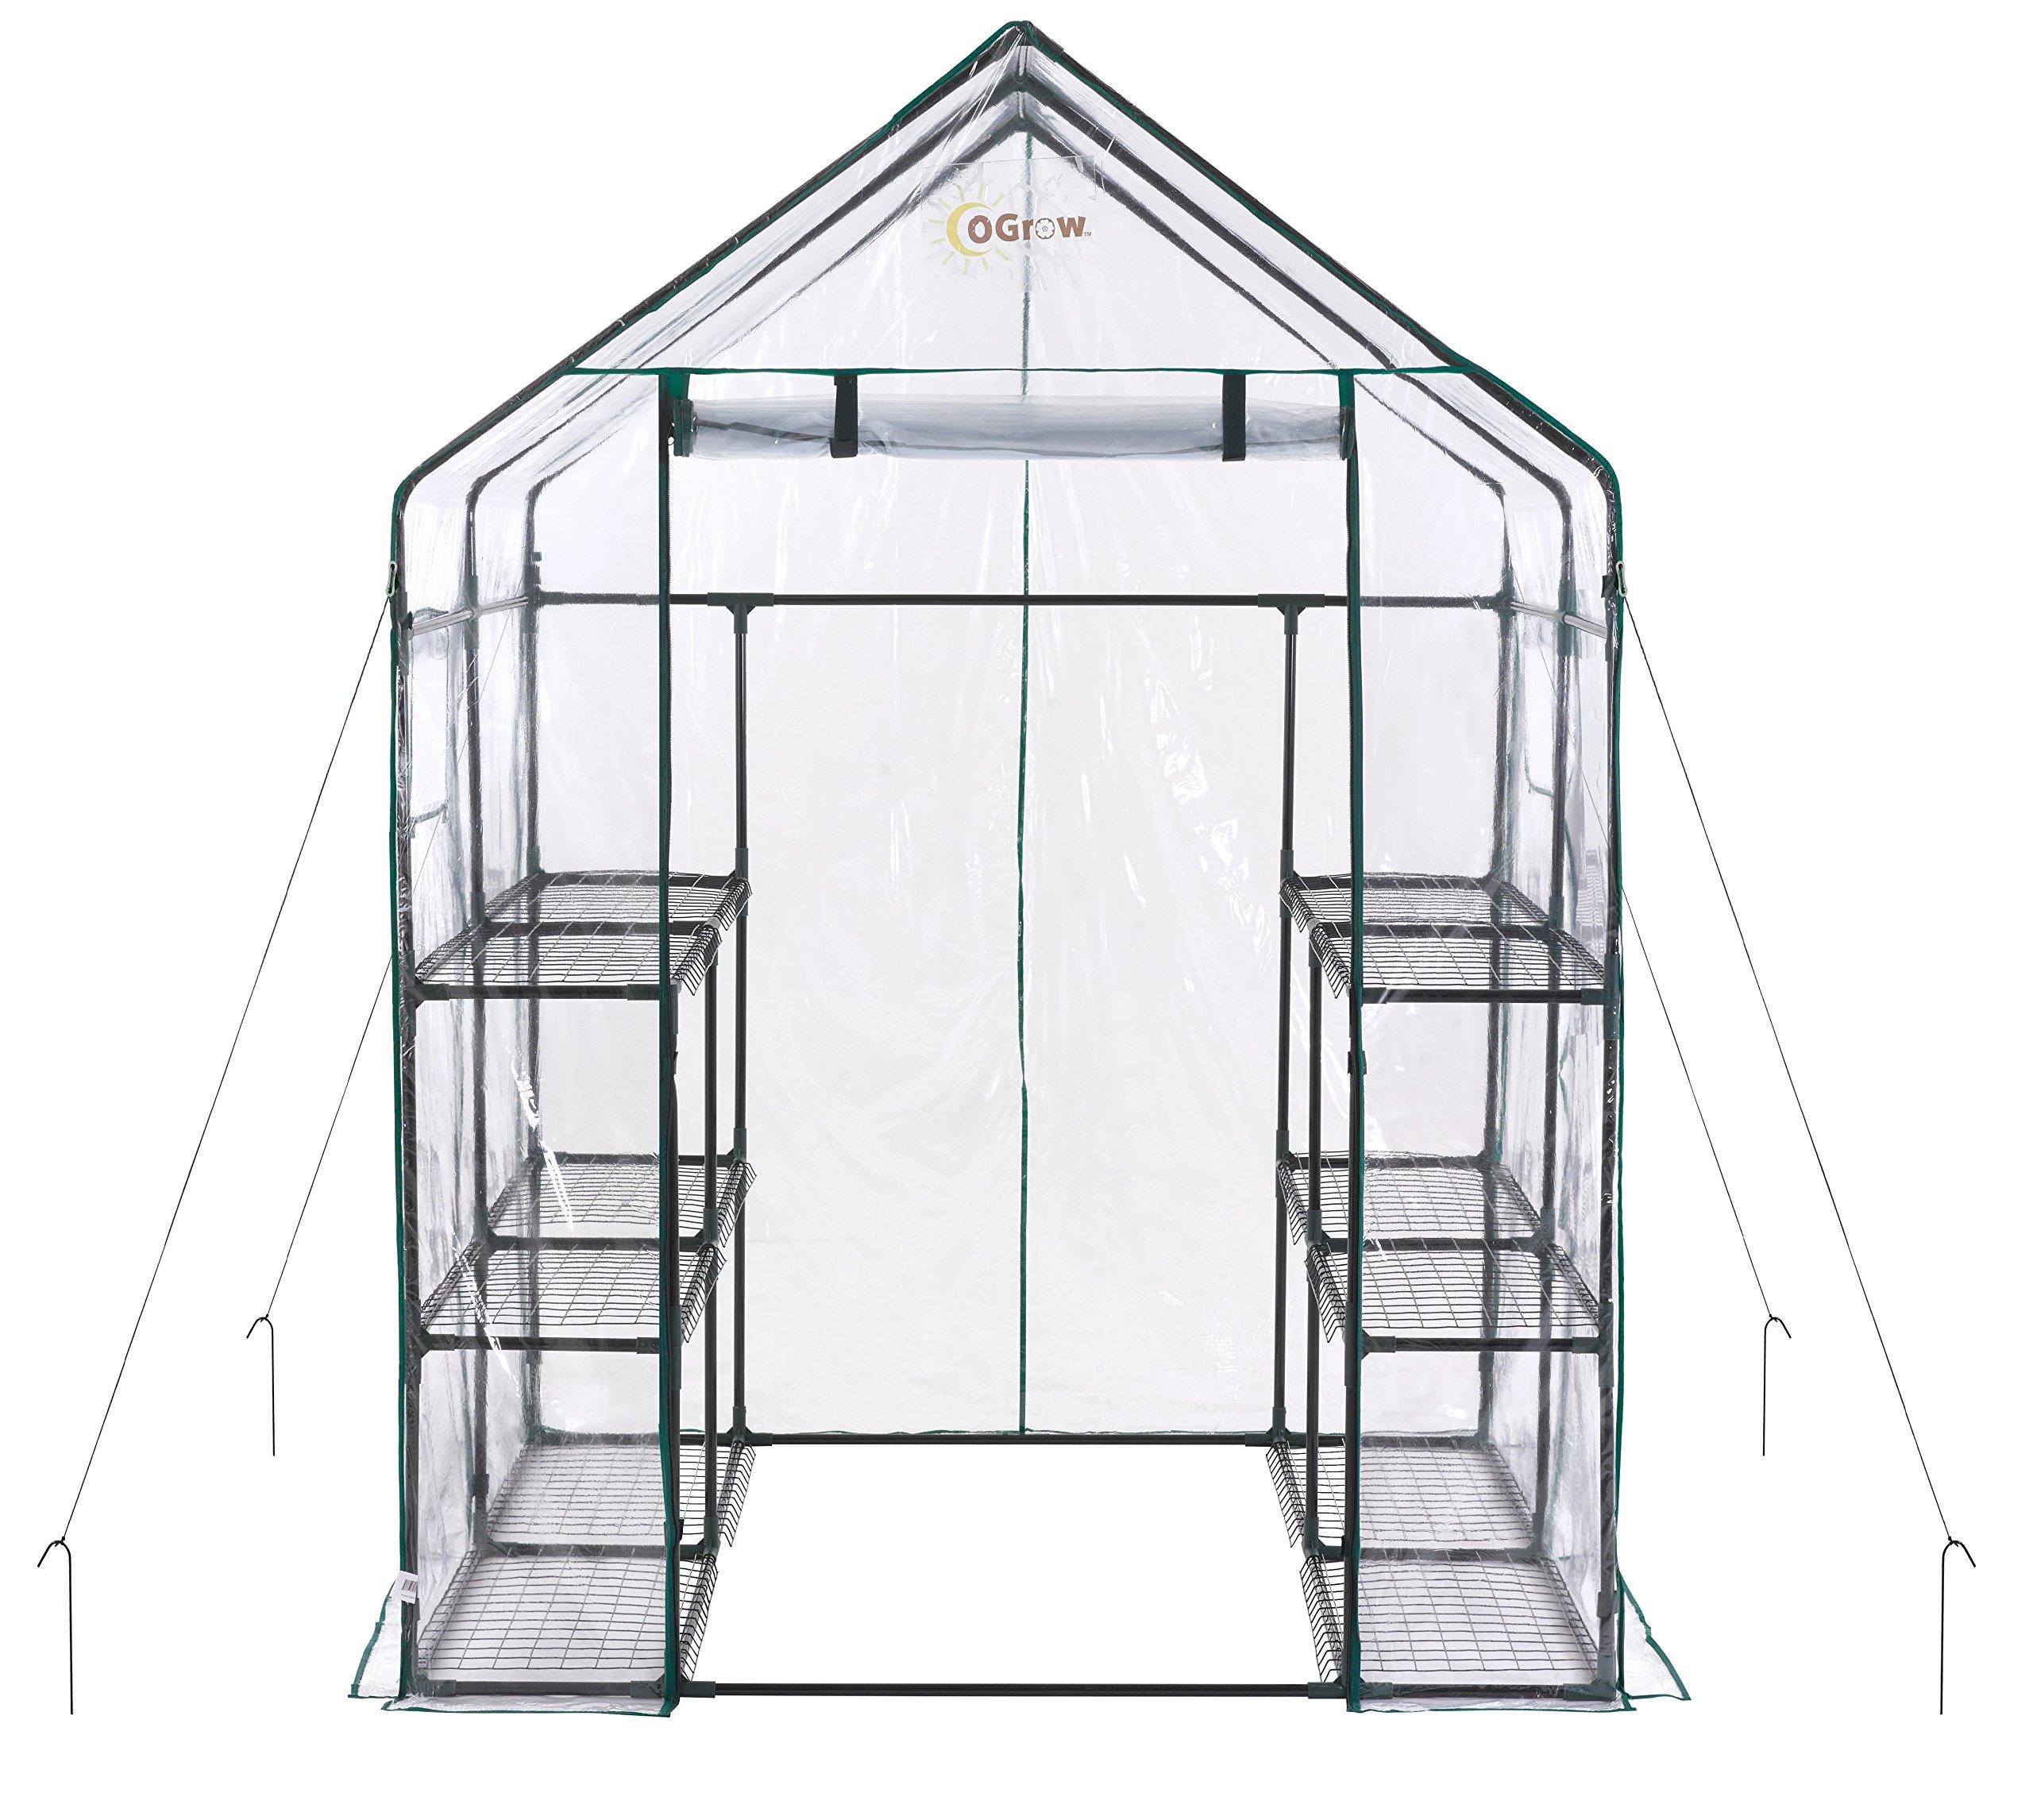 Ogrow Deluxe WALK-IN 6 Tier 12 Shelf Portable GREENHOUSE by OGrow